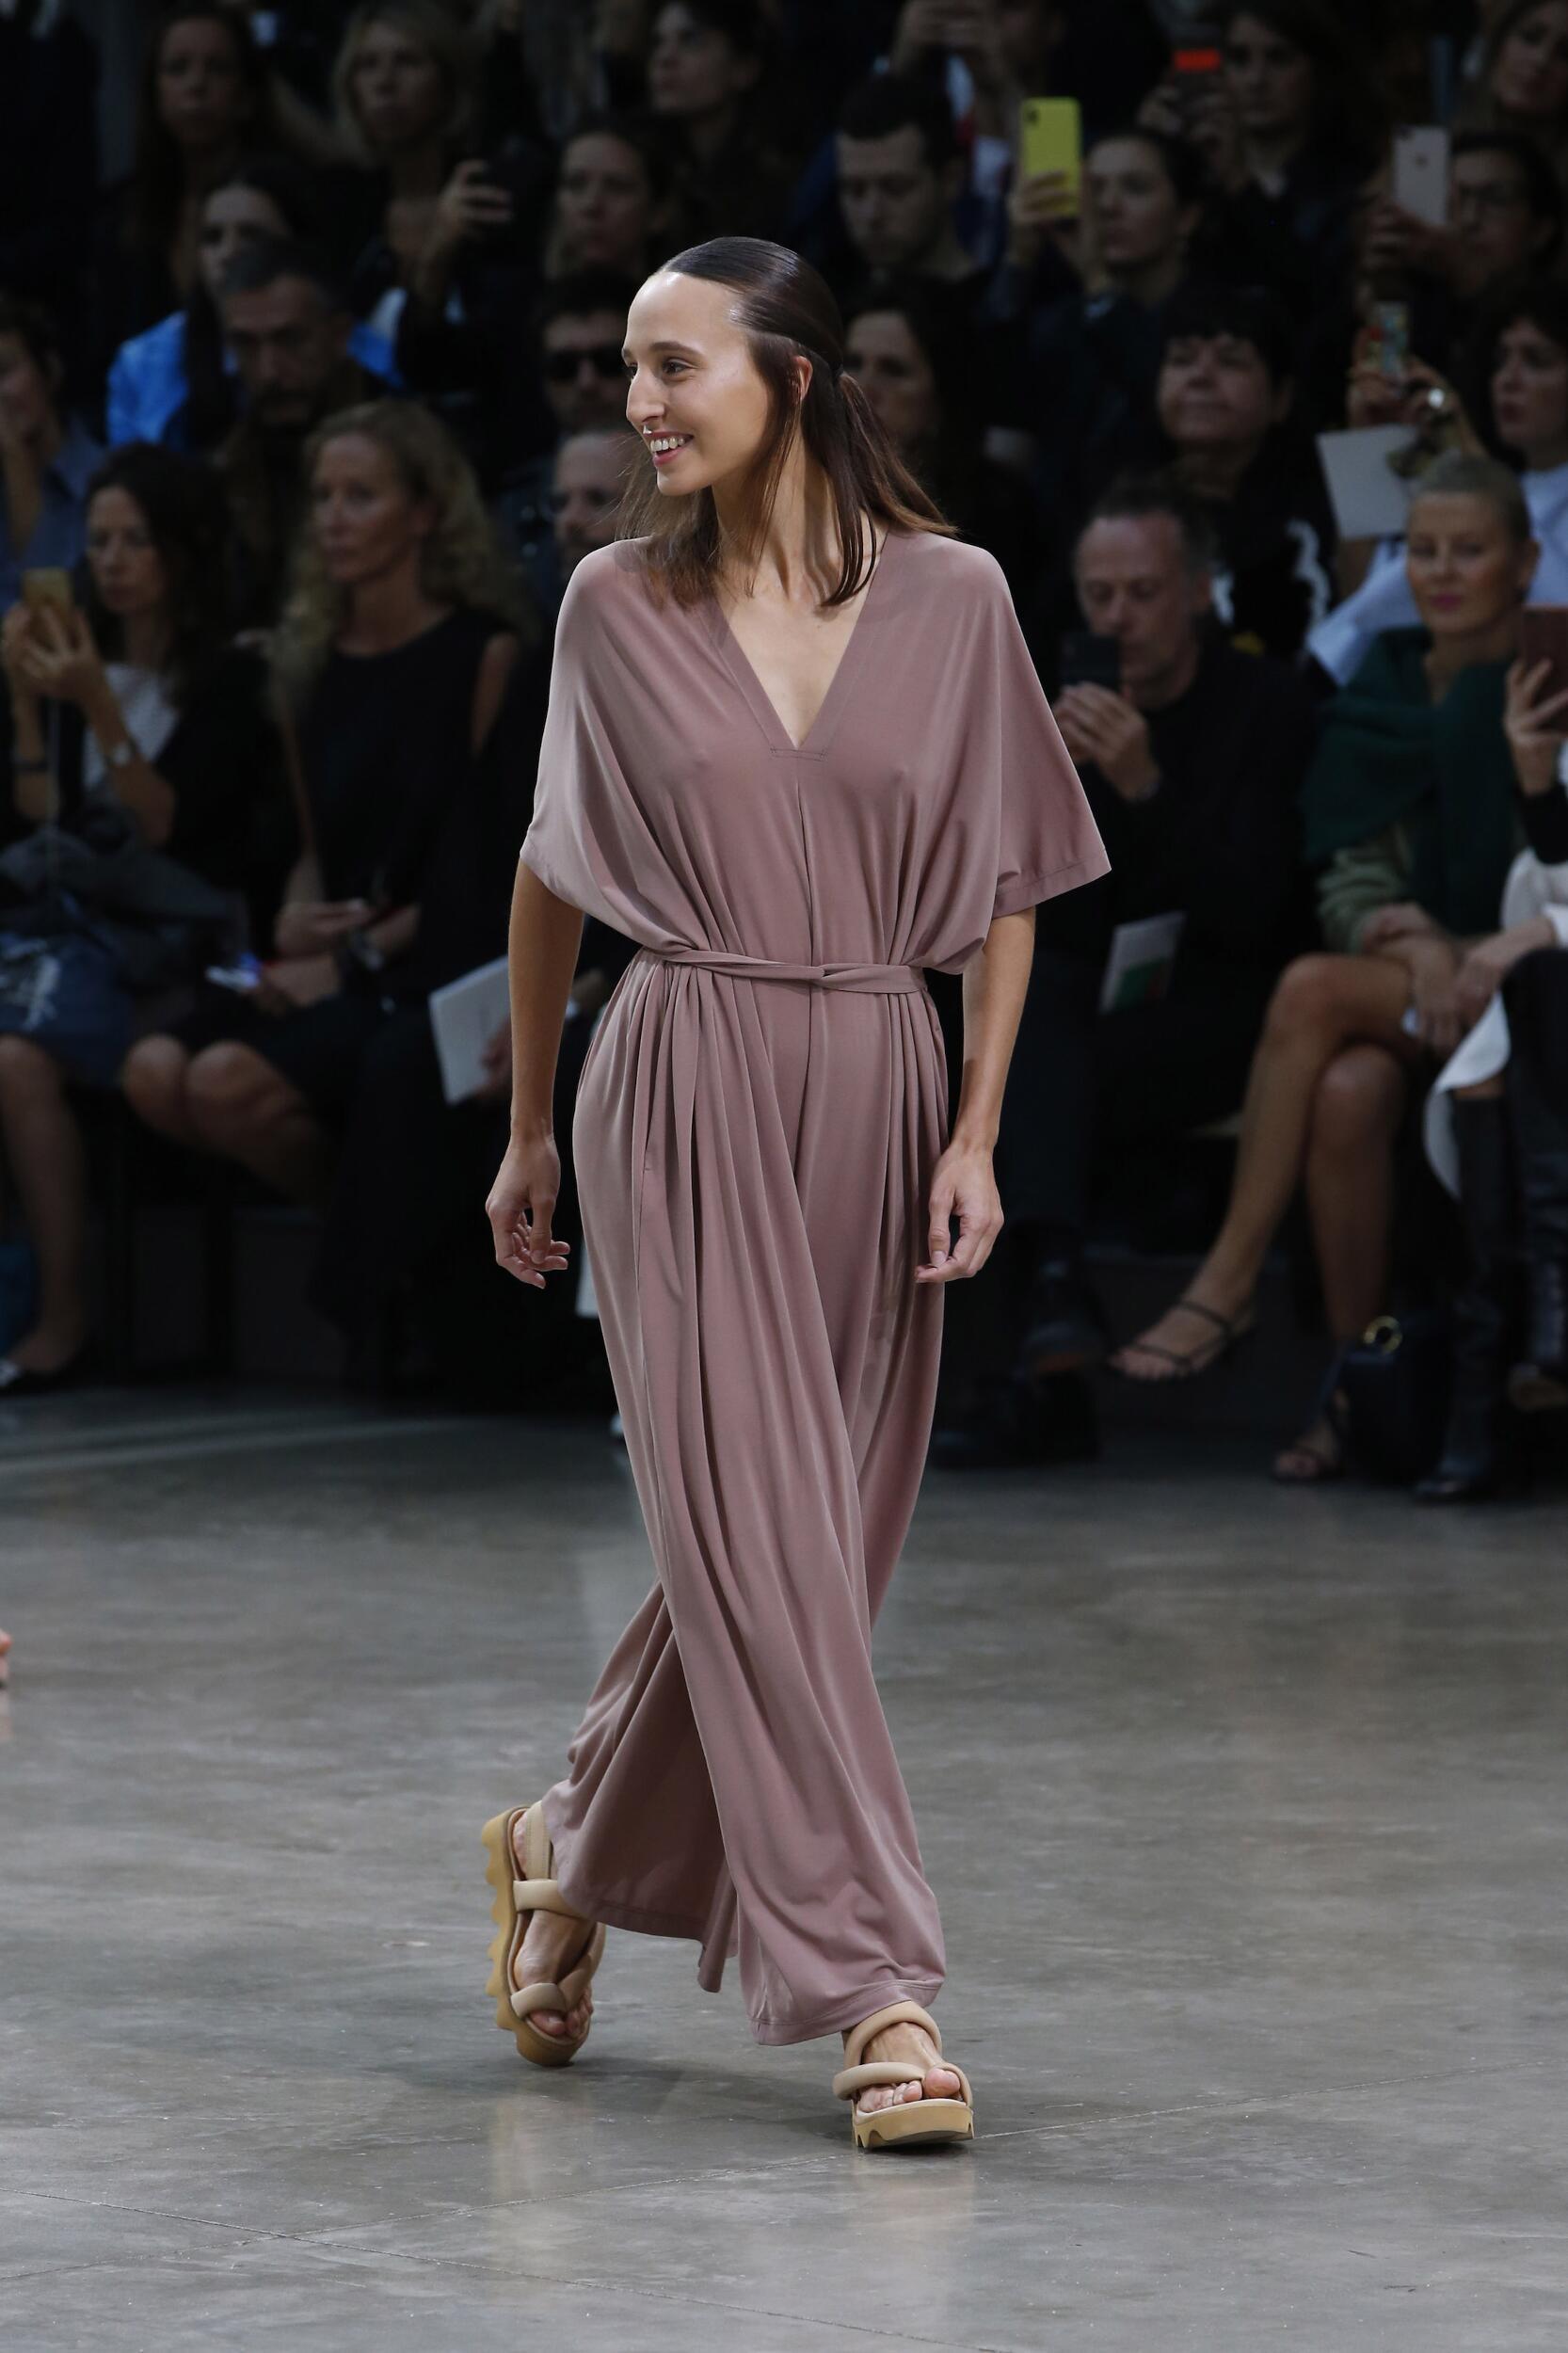 Model Fashion Show Issey Miyake